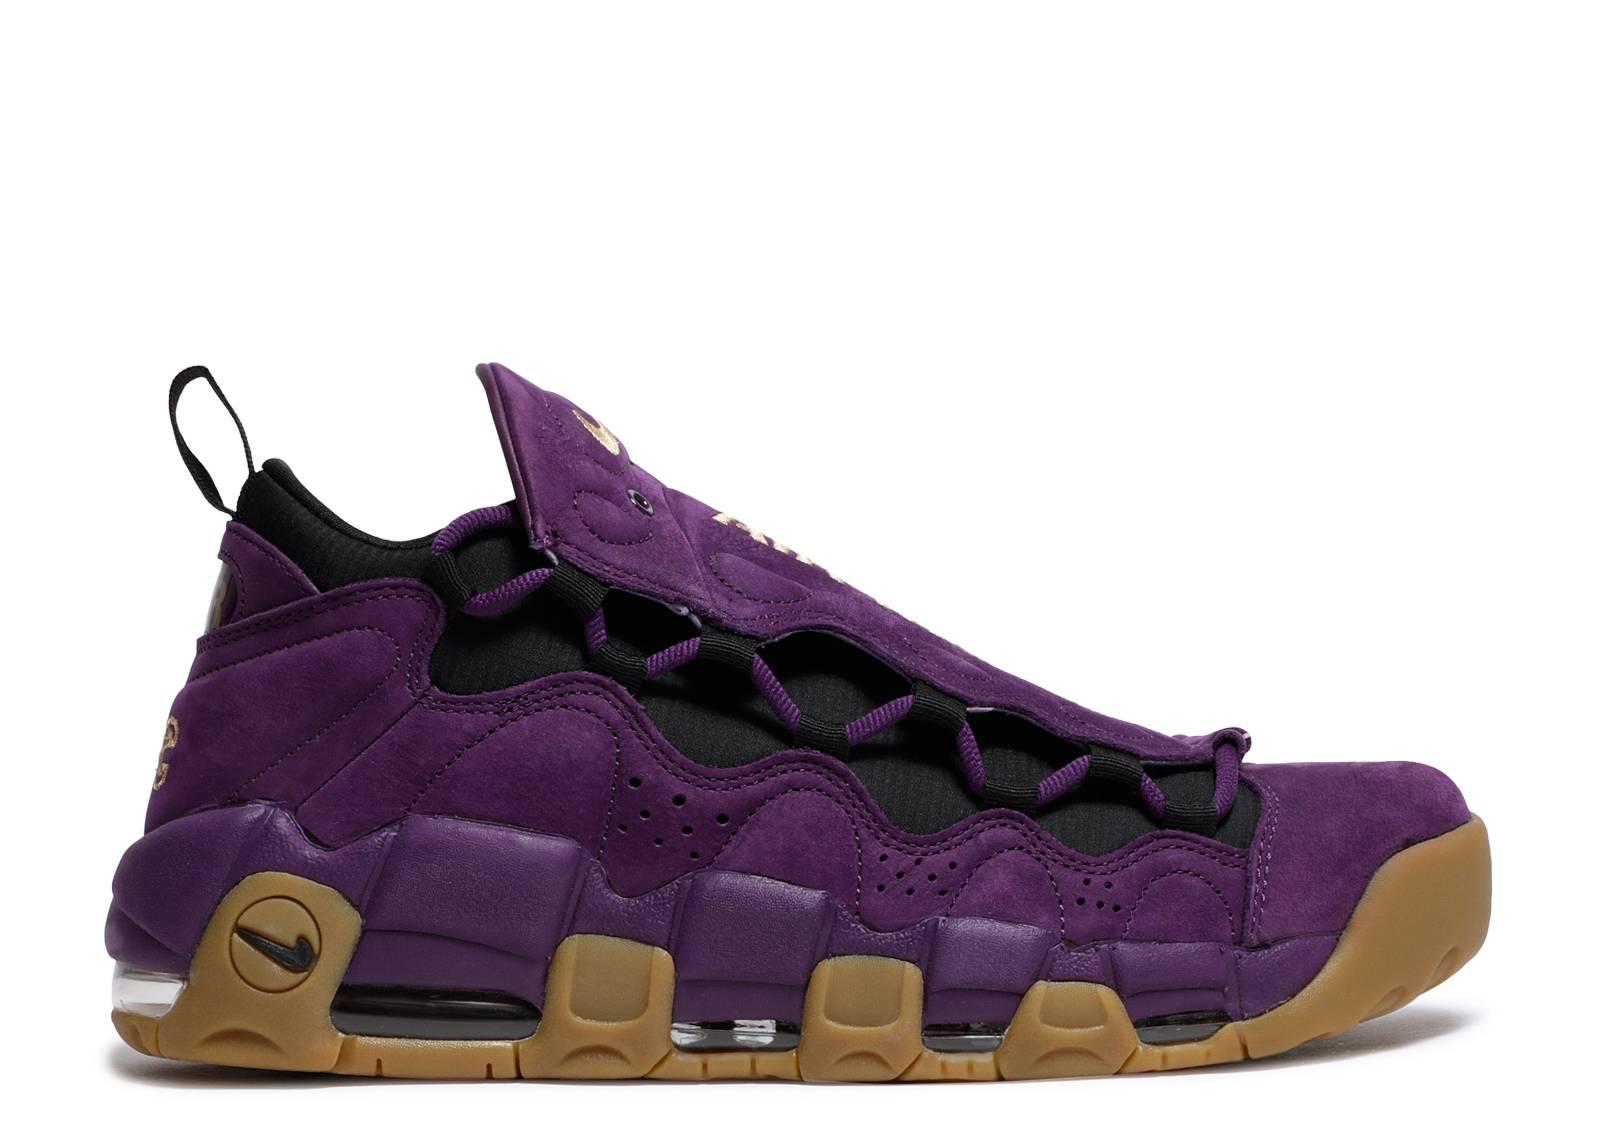 Air More Money - Nike - AR5401 500 - night purple metallic gold ... 594ab5f4a